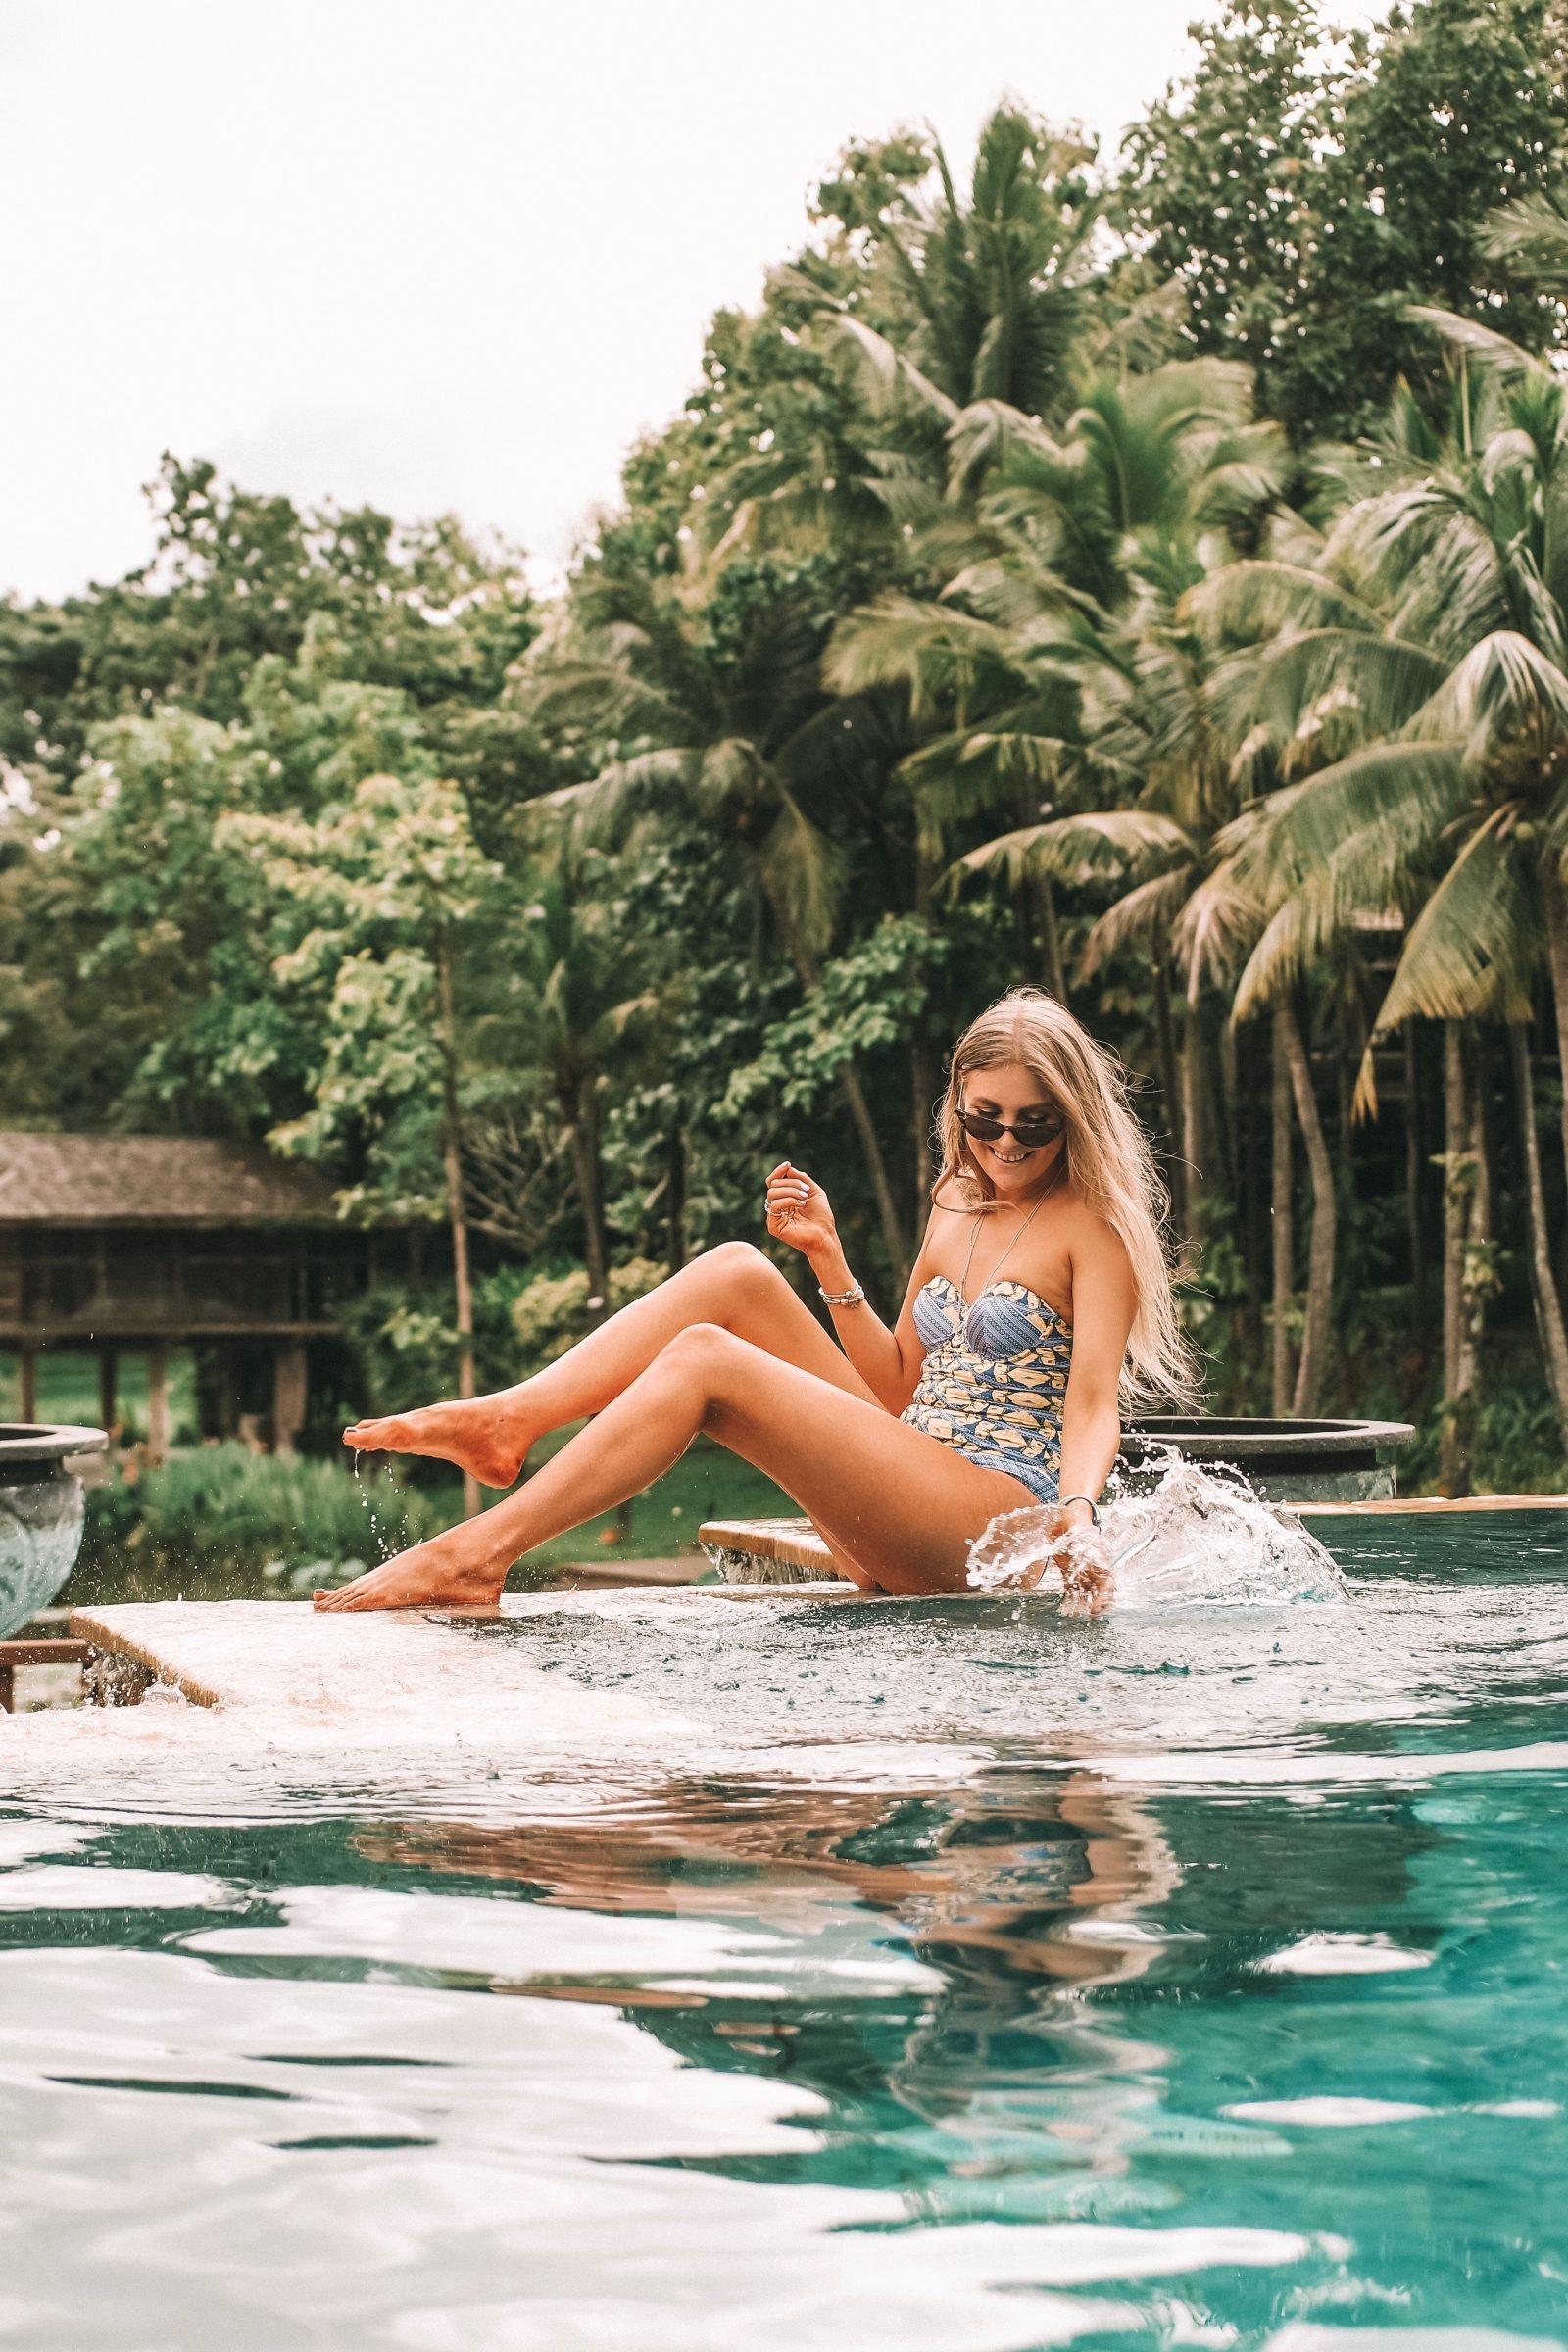 Luxury Swimwear Paolita Beachwear - Four Seasons Chiang Mai